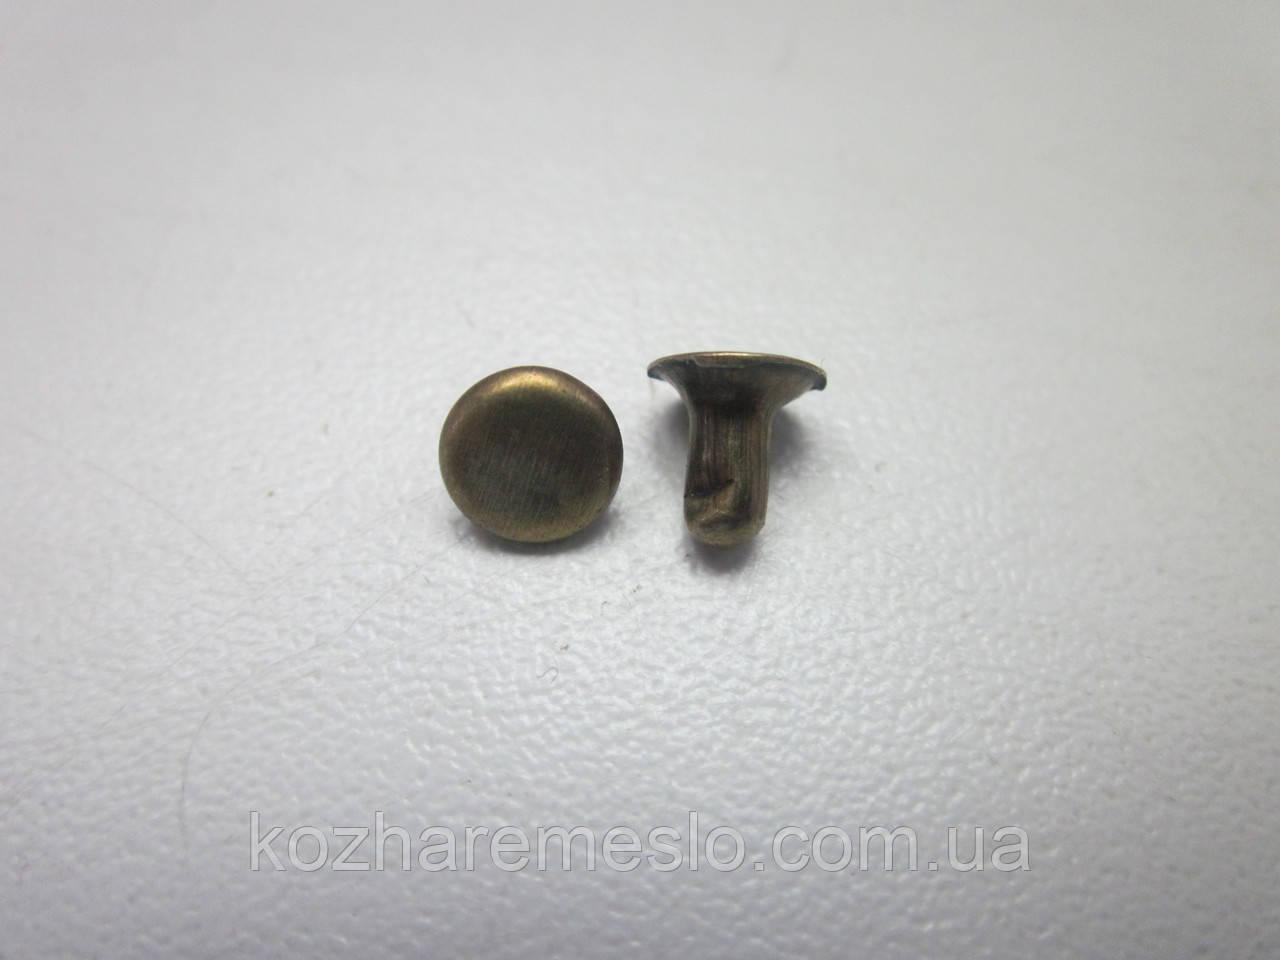 Хольнитен (заклёпка) односторонний 8 х 8 х 8 мм антик